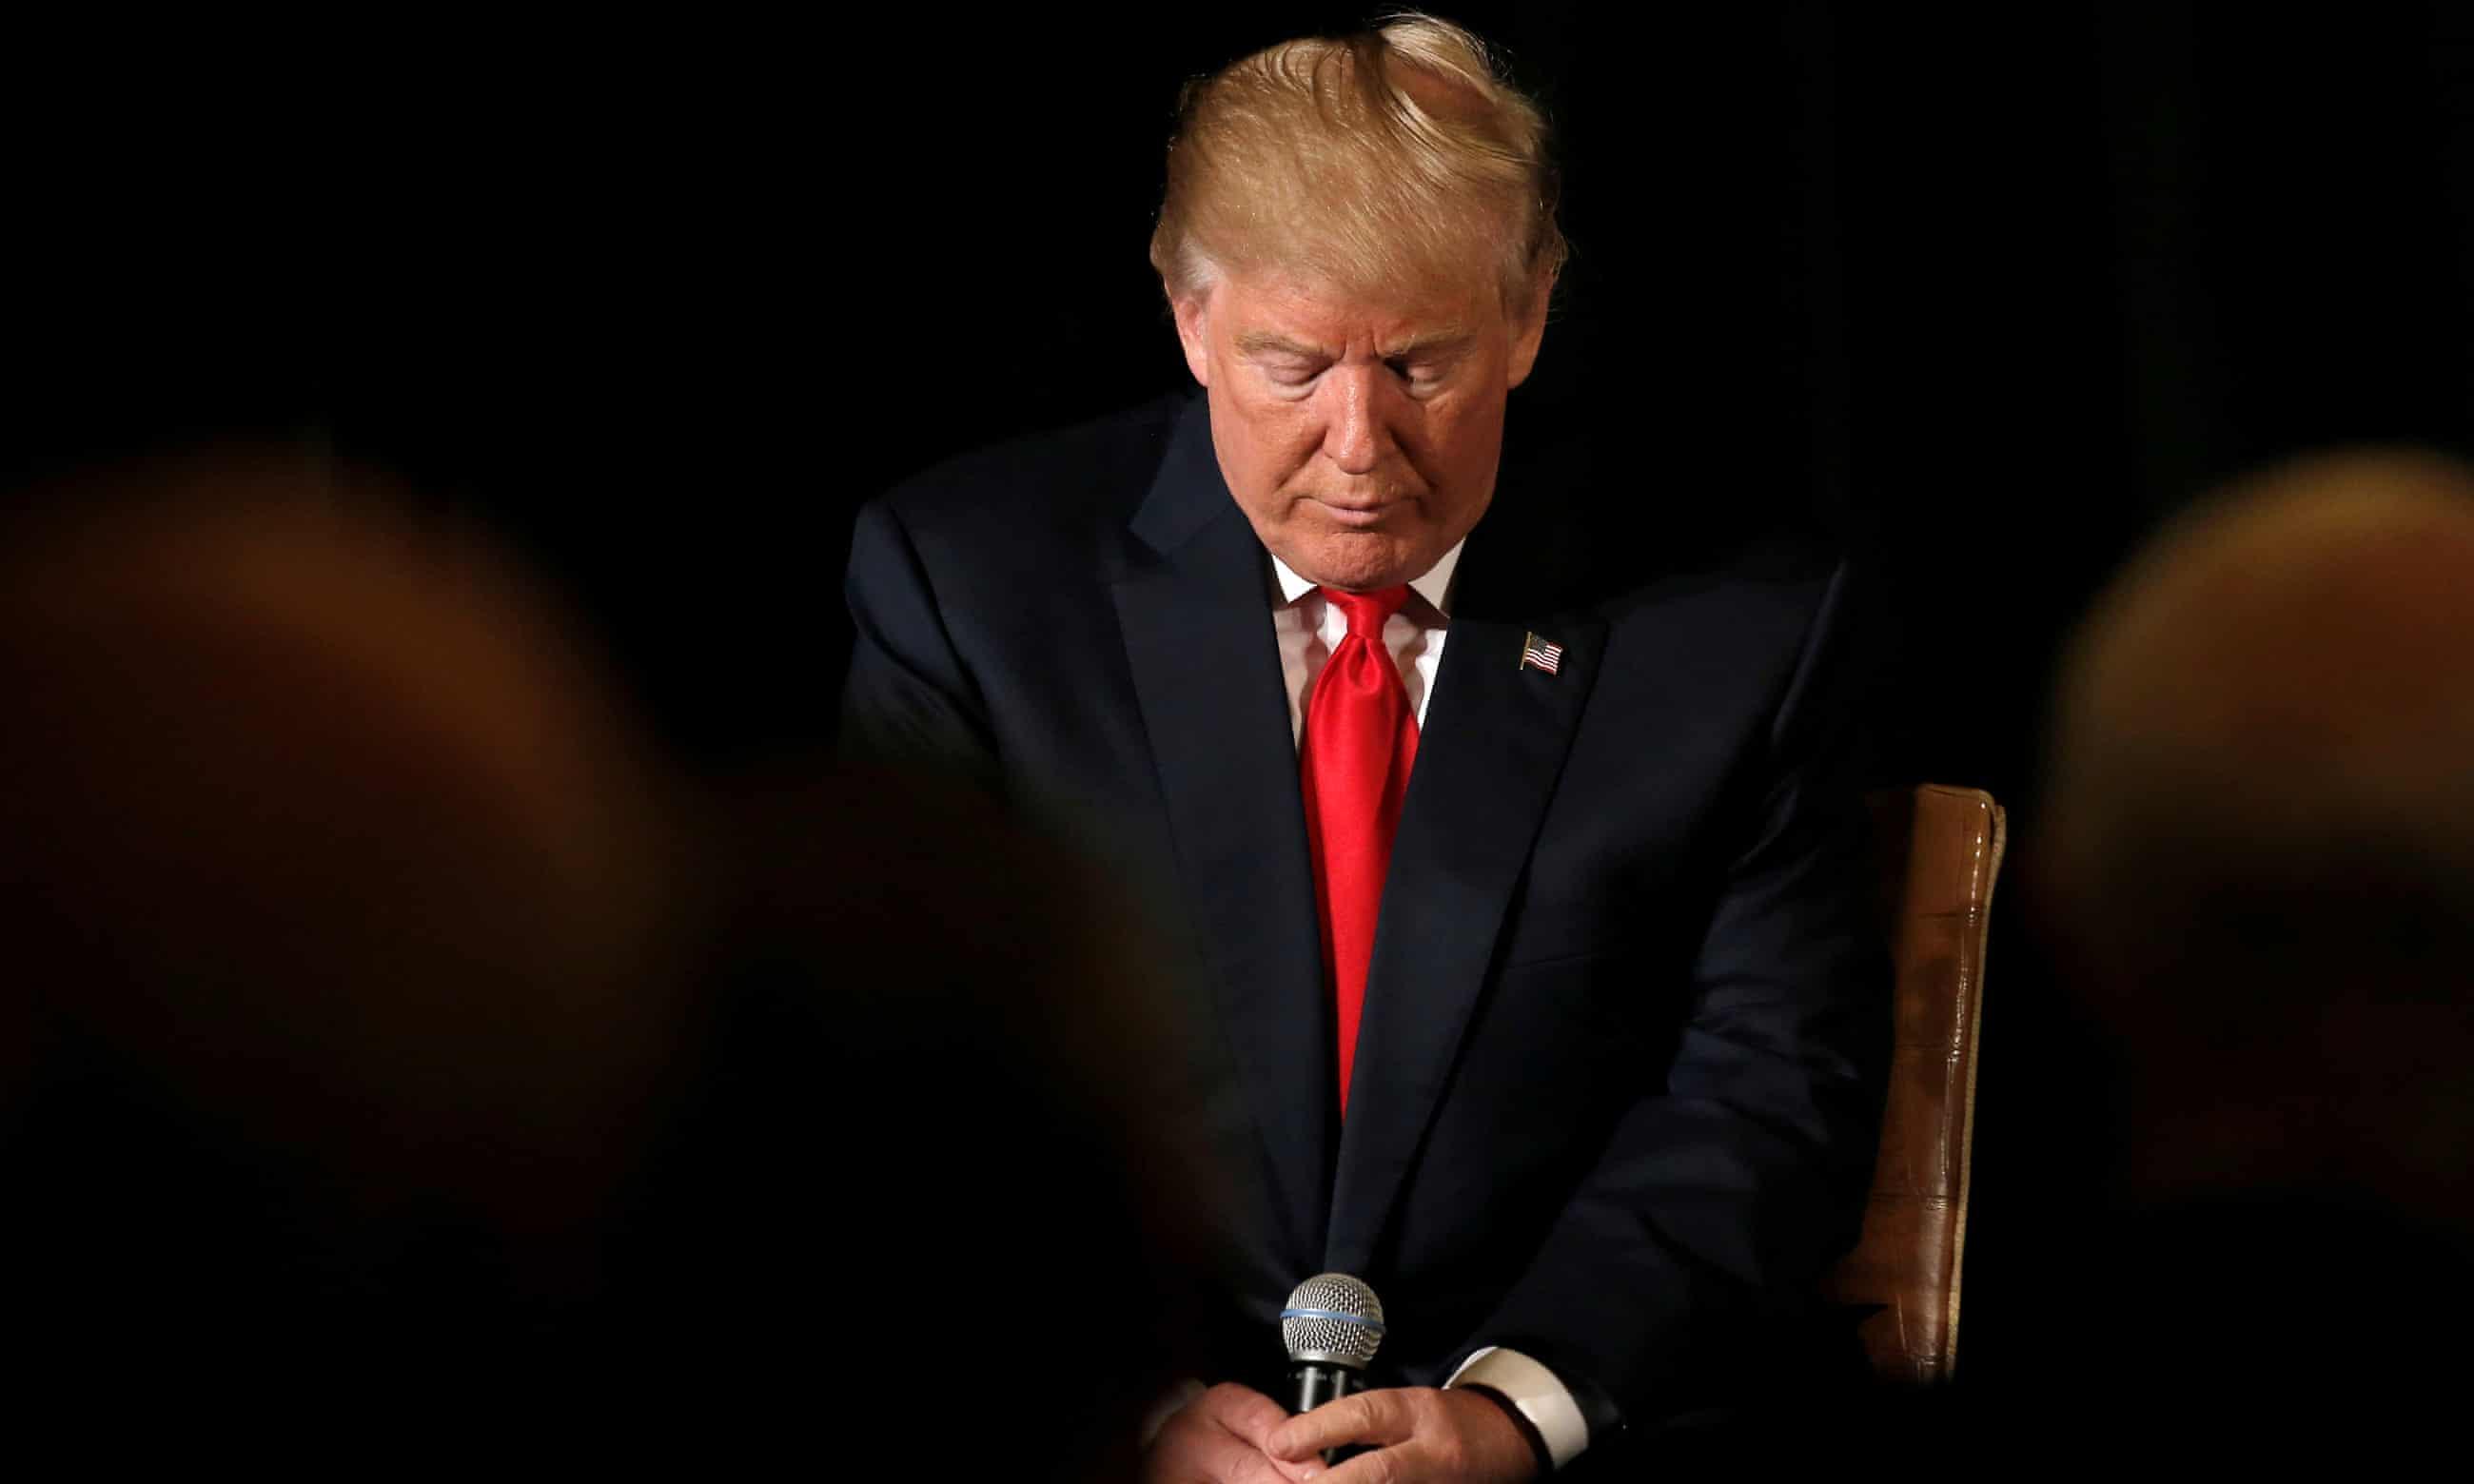 The Minute - Trump closet spills chorus line of skeletons